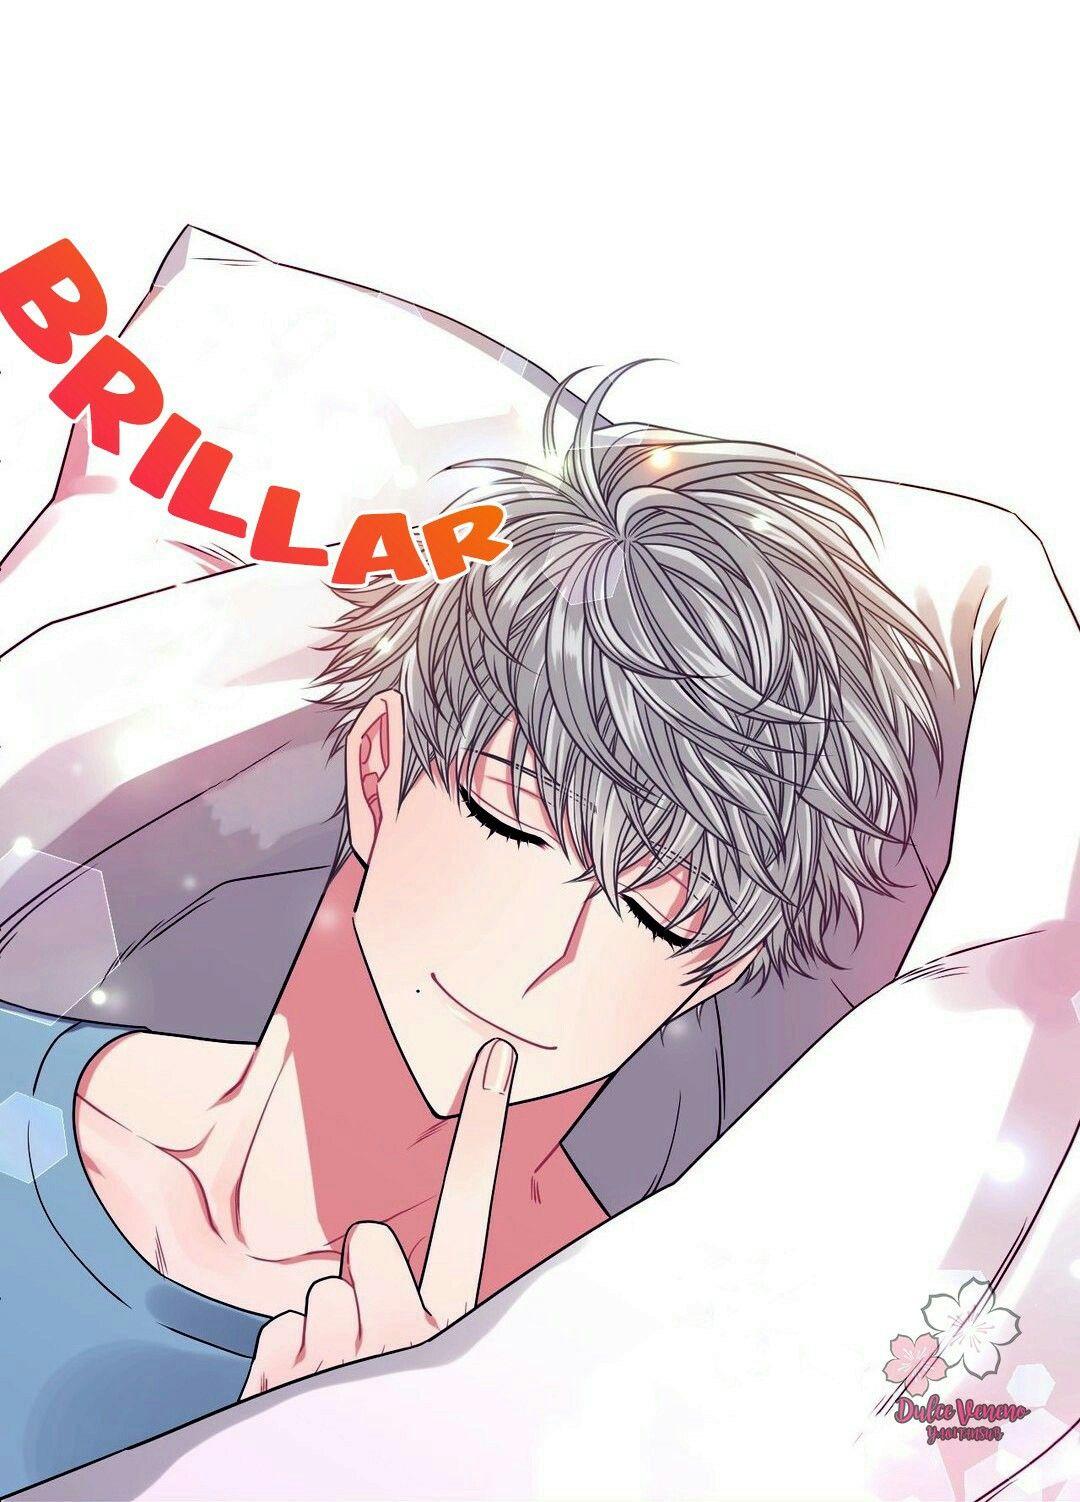 Pin em Anime/Manga